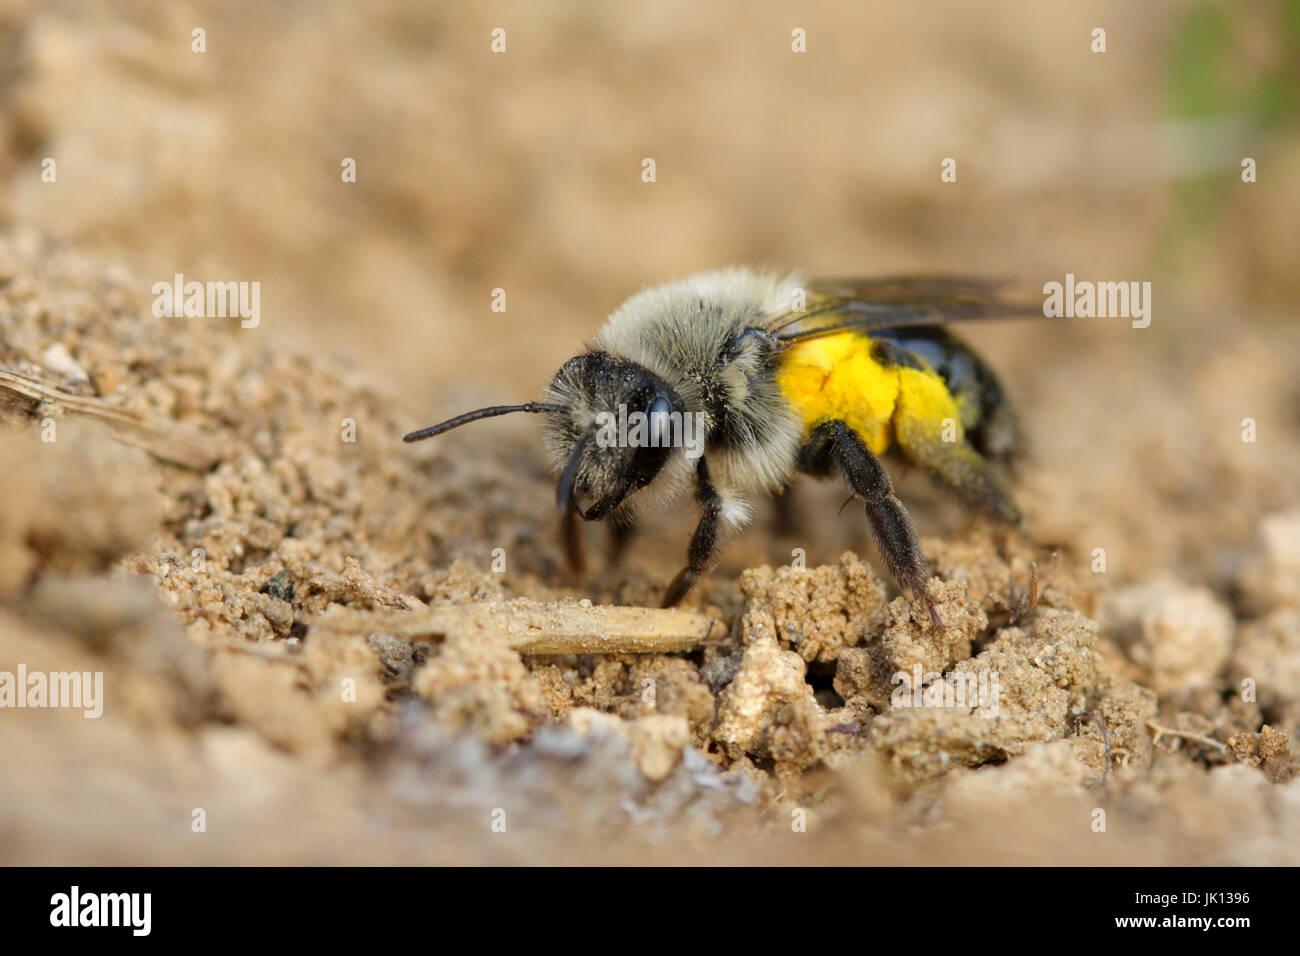 Sandy bee regeandrena vaga, Sandbiene (regeandrena vaga) - Stock Image